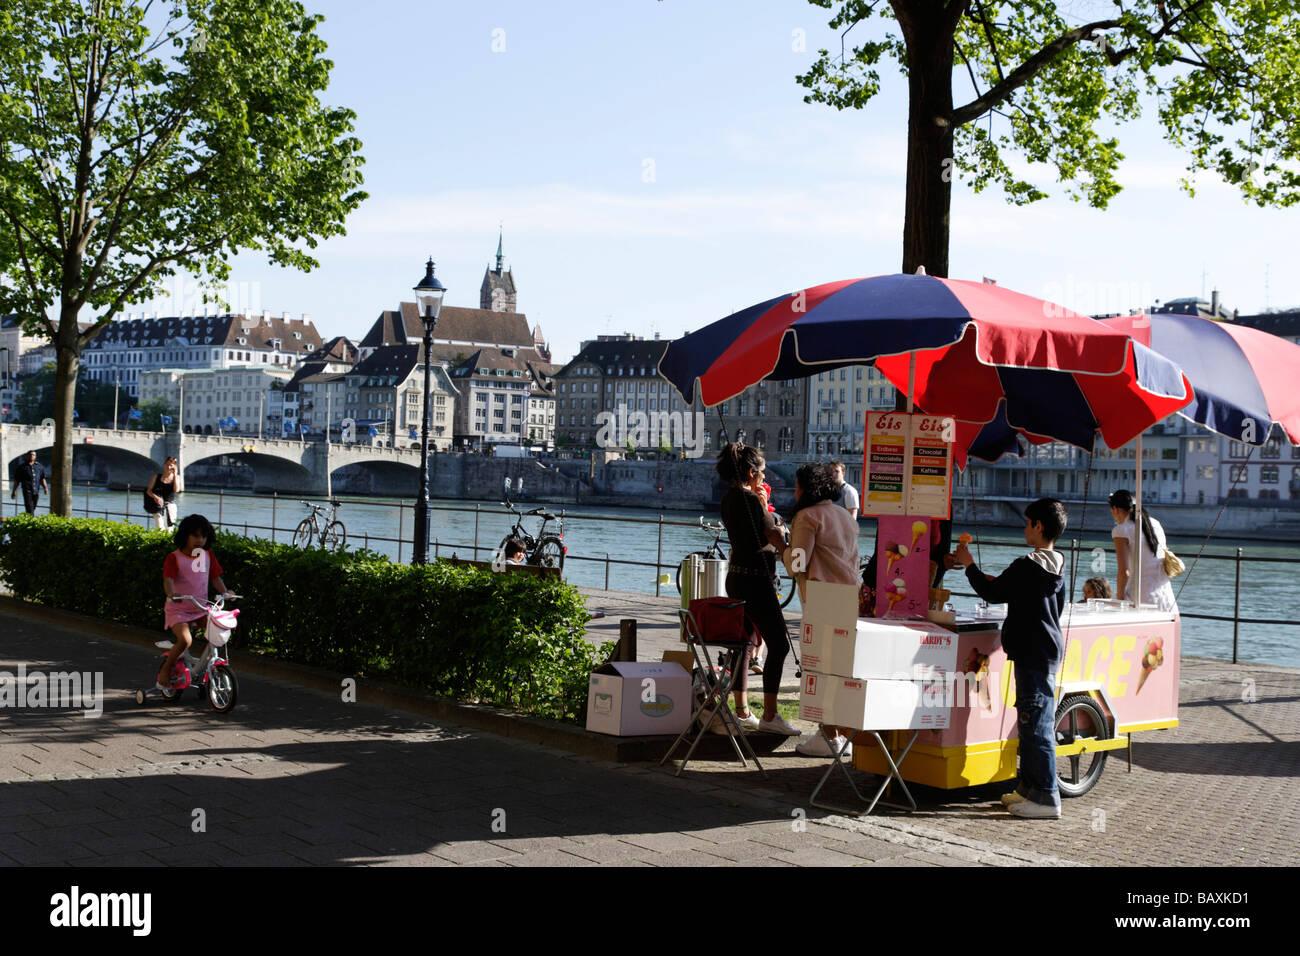 Ice-cream cart along the banks of the River Rhein, Riviera Klein-Basel, Basel, Switzerland - Stock Image